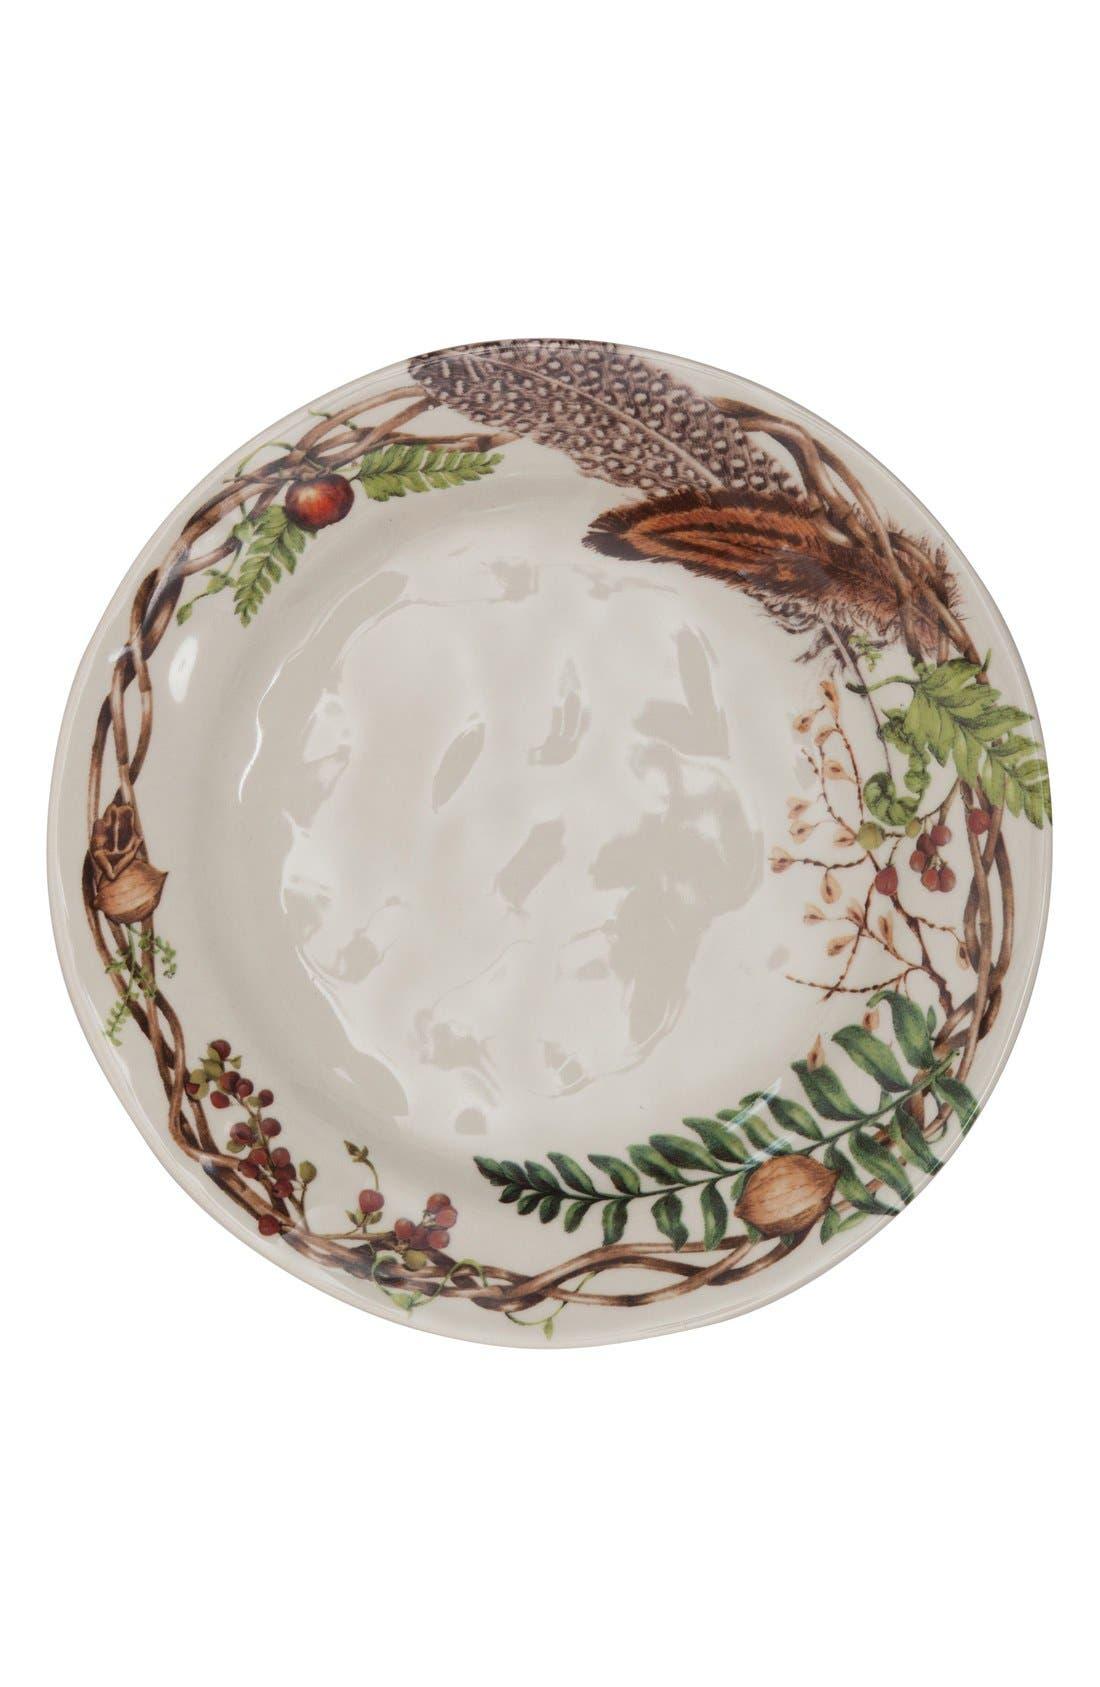 Forest Walk Dinner Plate,                         Main,                         color, CAF AU LAIT